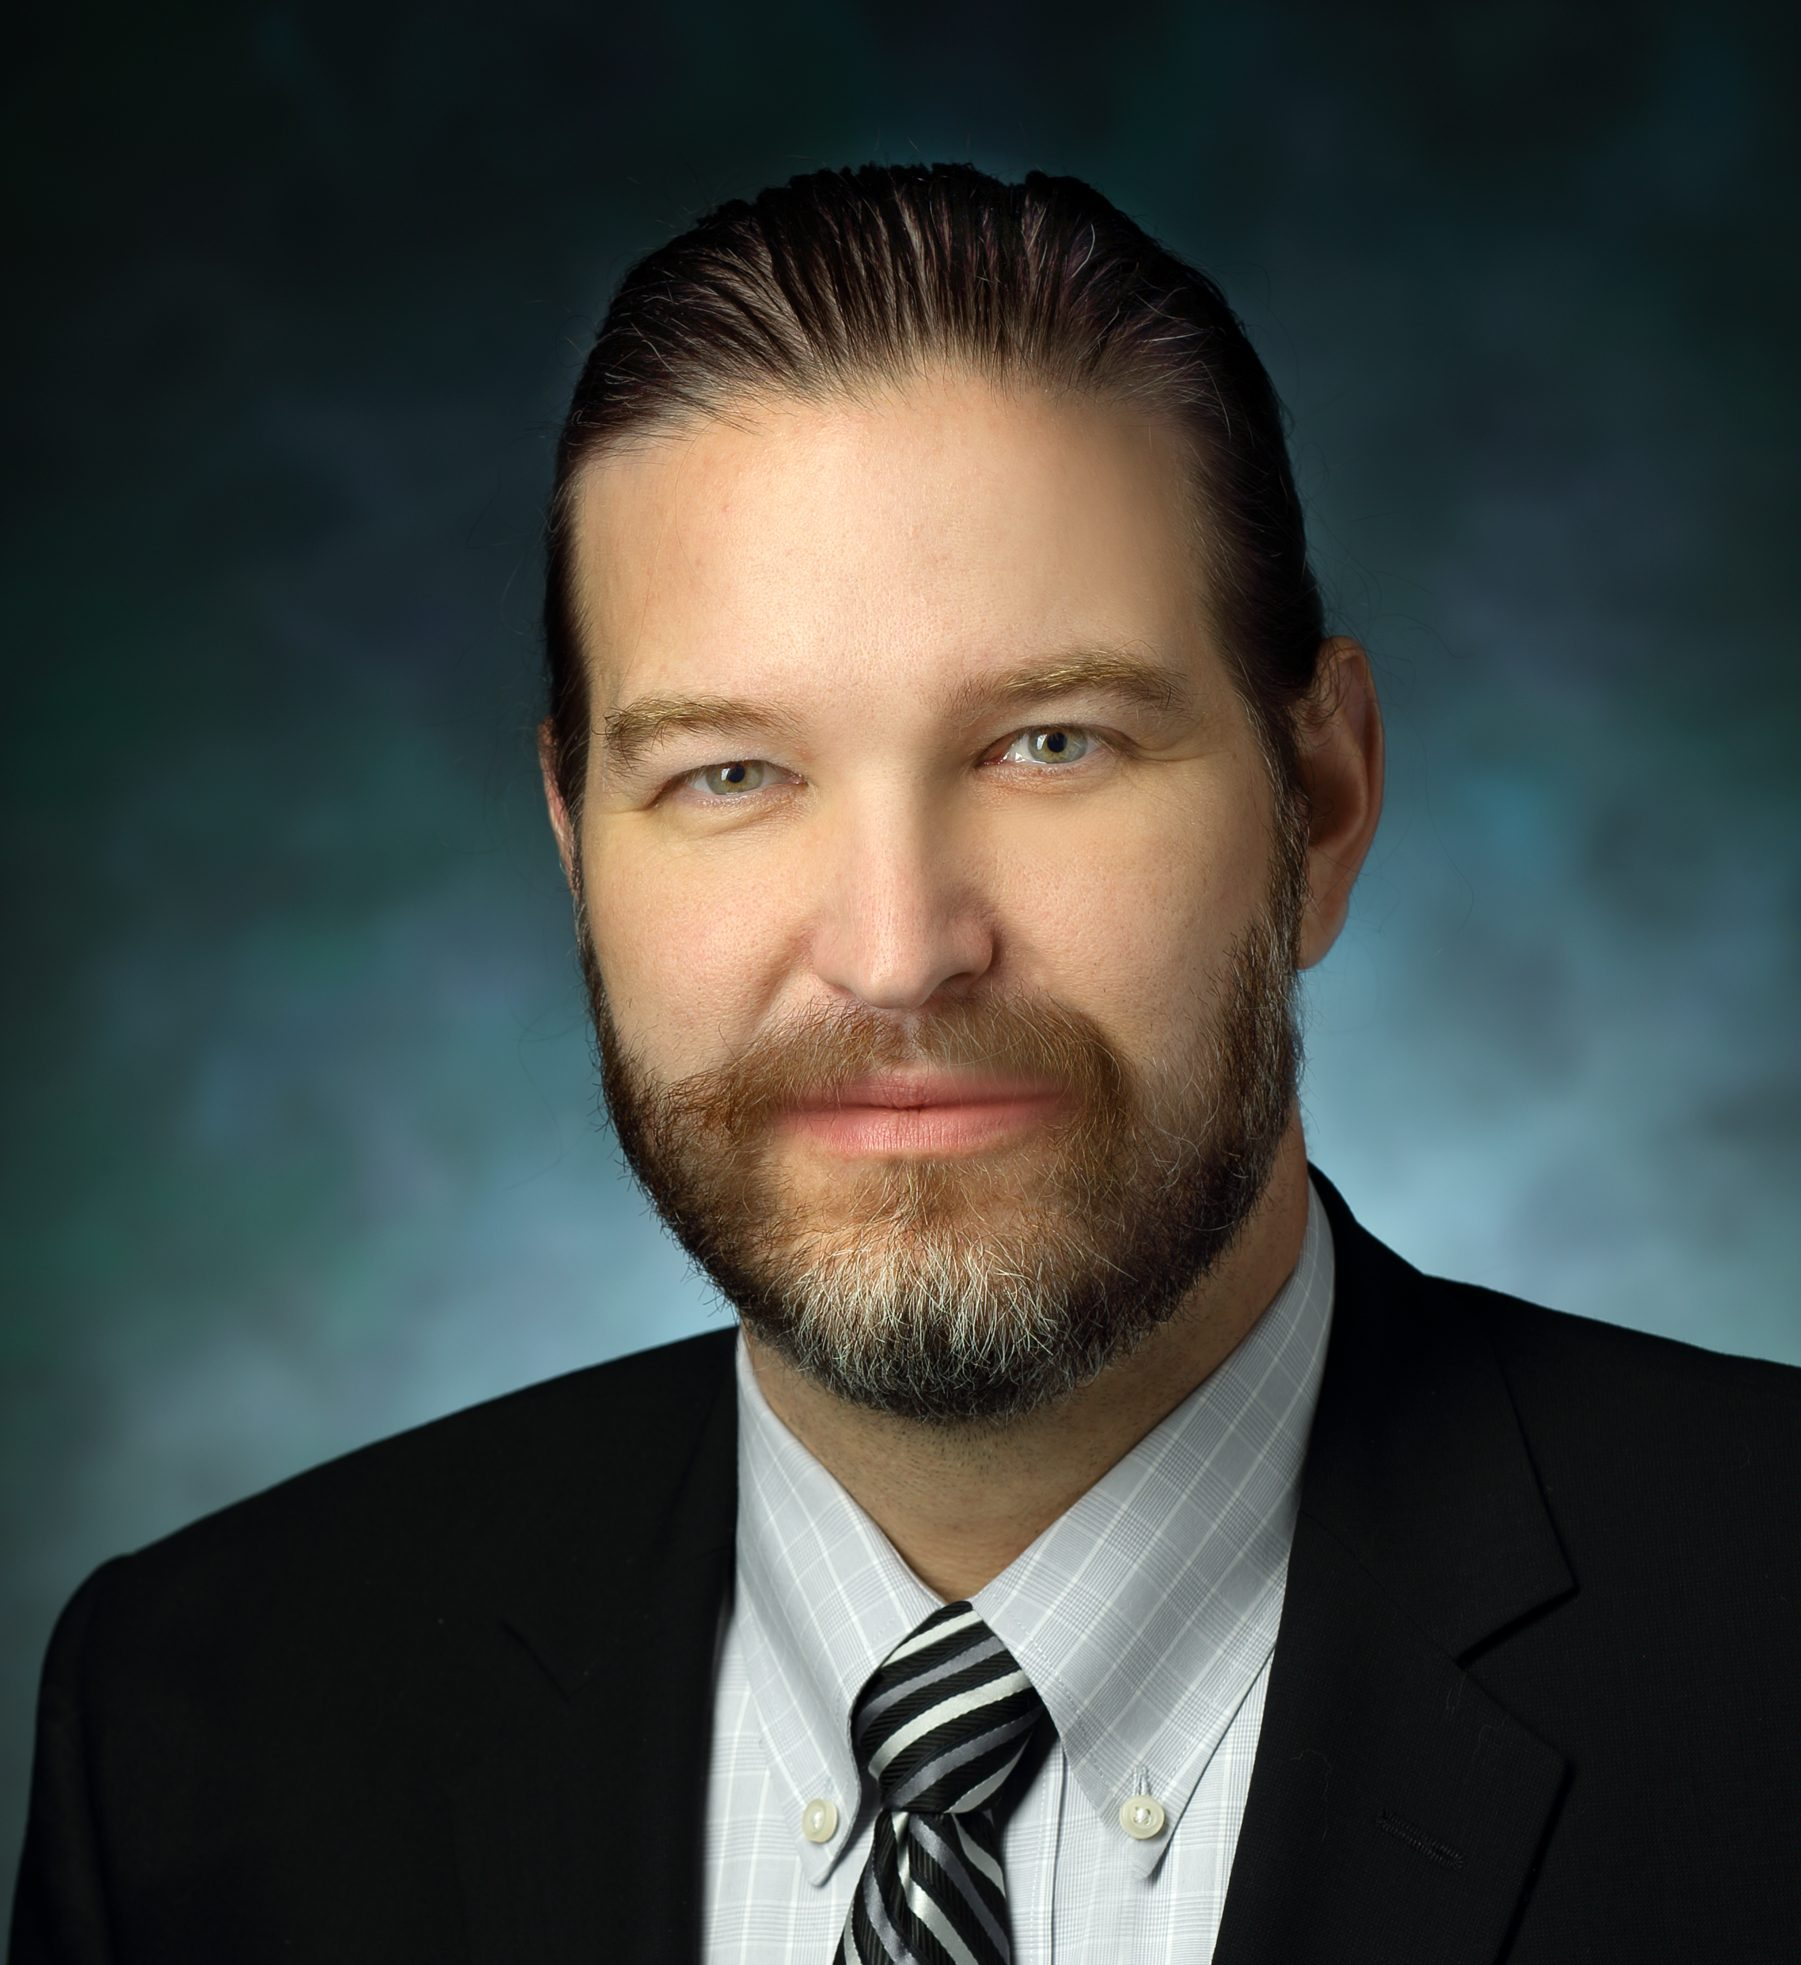 Eric K. Hutchinson, DVM, DACLAM